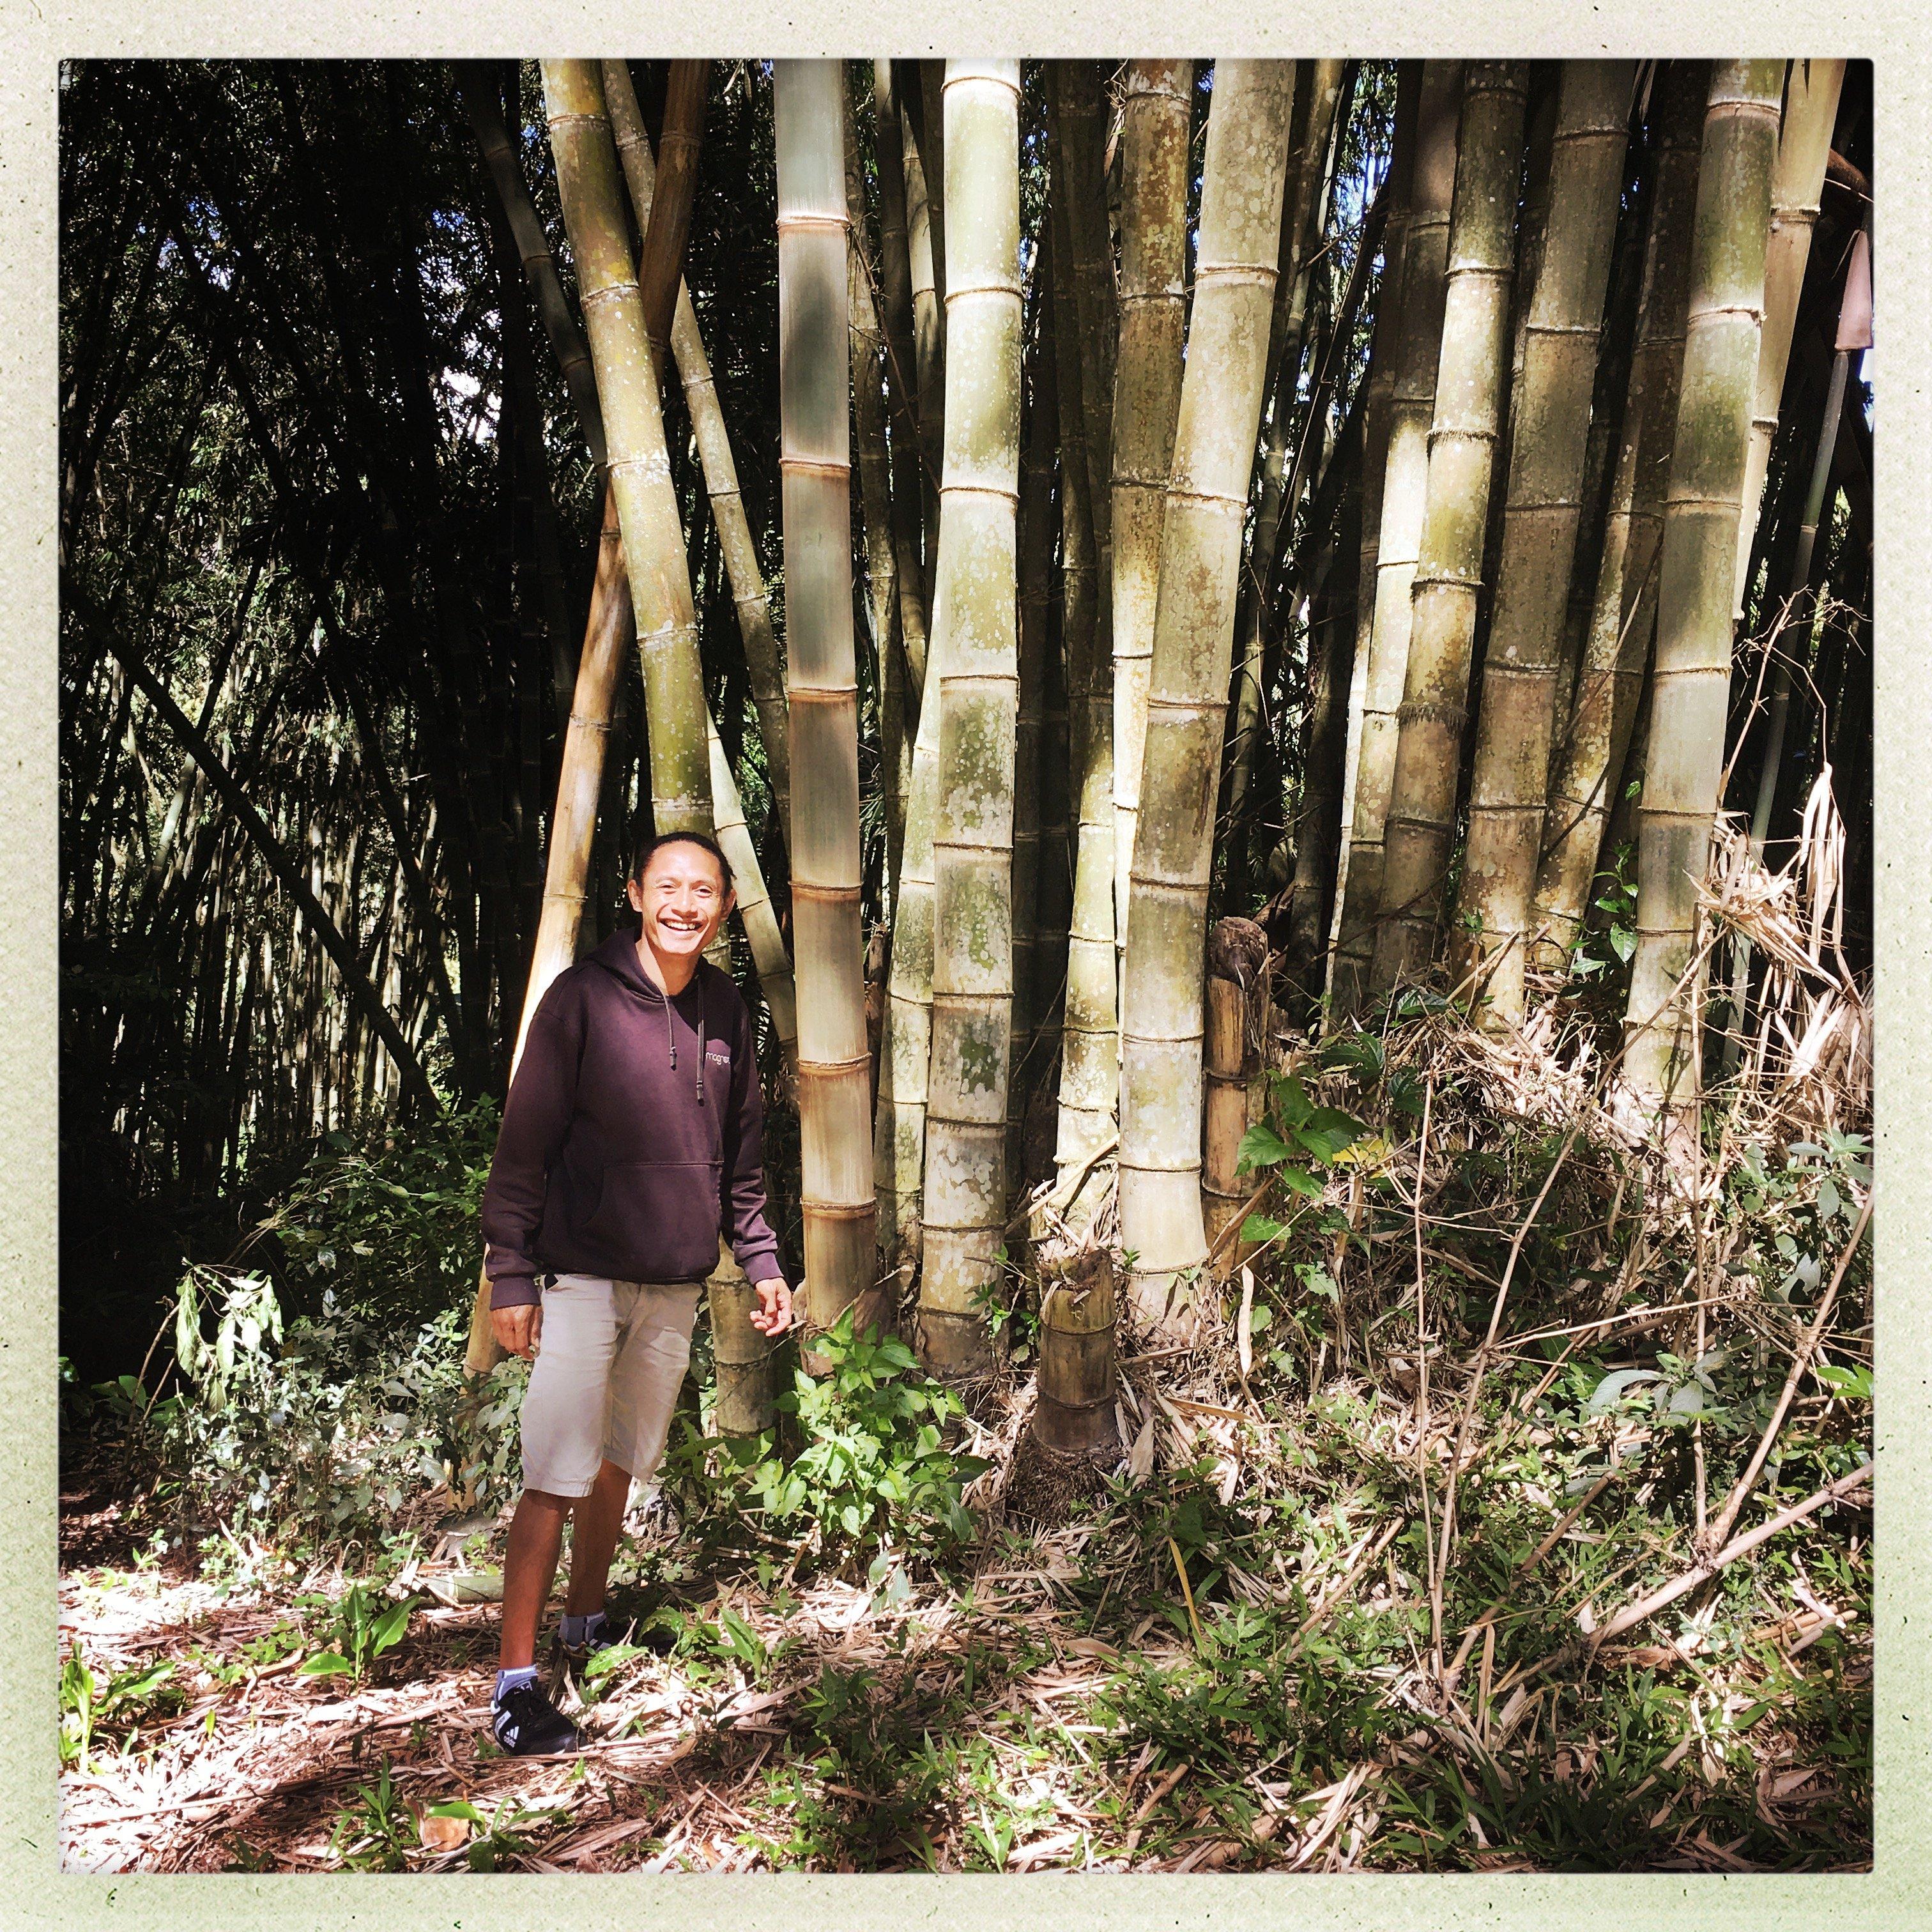 Bamboo forest, komodo island, lokal market, inerie volcano